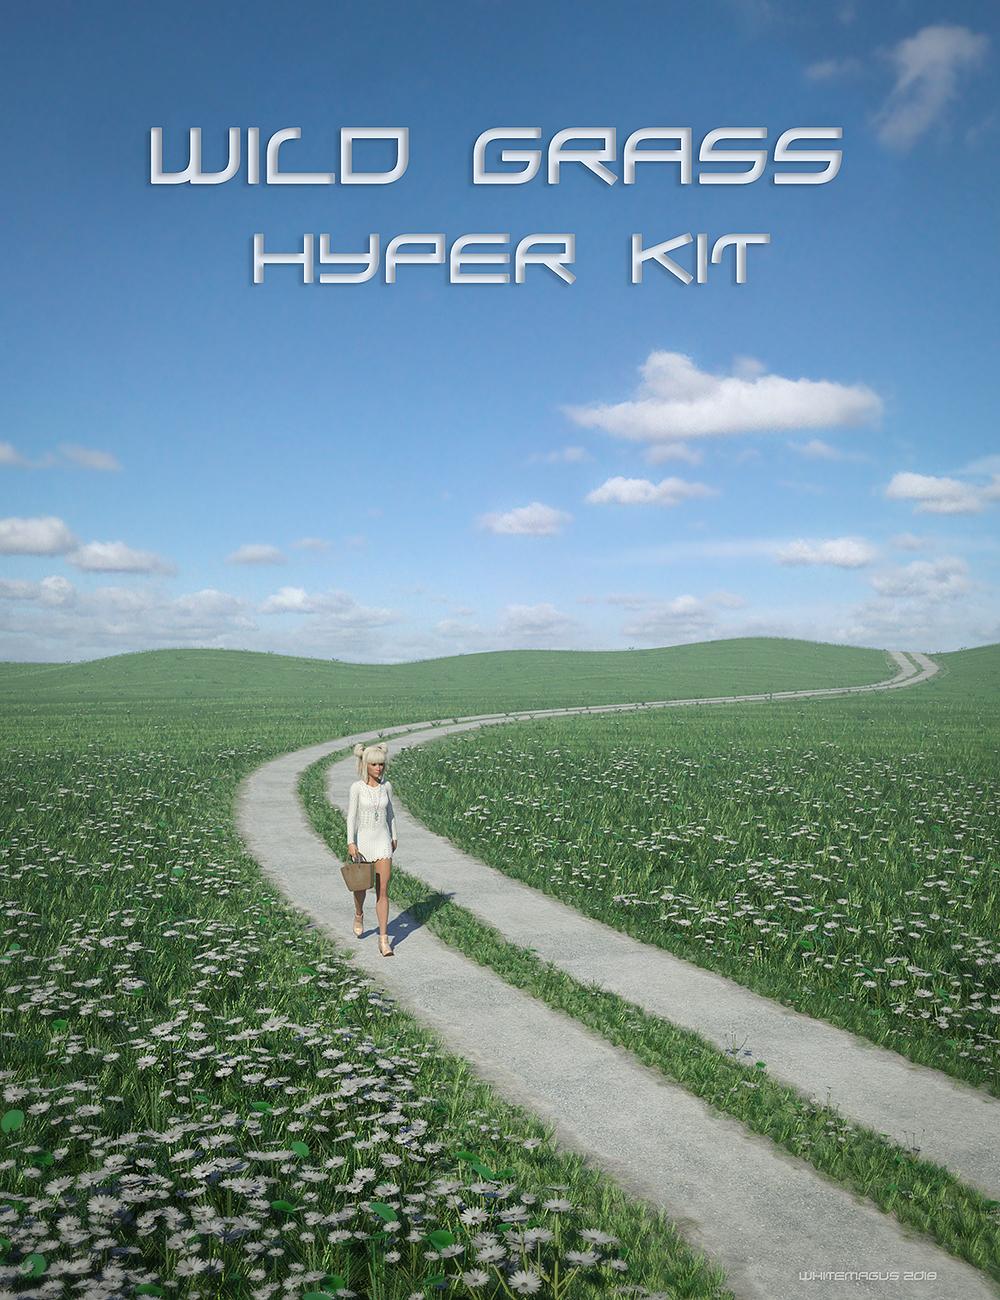 Wild Grass Hyper Kit by: Whitemagus, 3D Models by Daz 3D